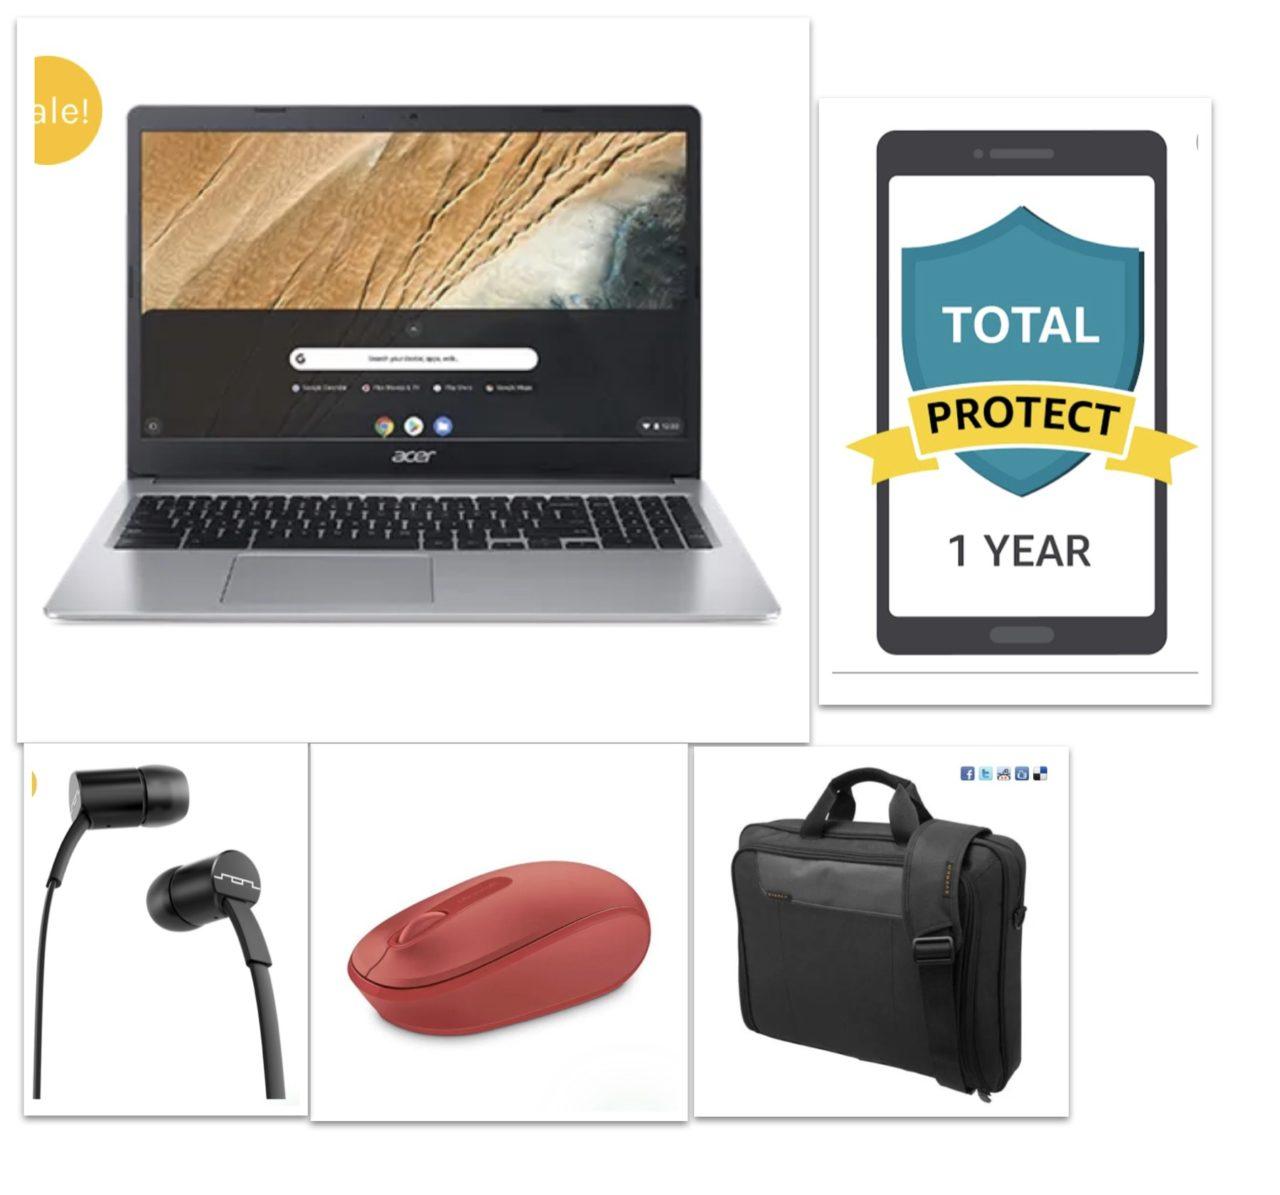 New Acer 15.6 Chromebook PREMIUM Bundle – Chromebook+Bag+Ear Phone+Mouse+12 Month Damage Protection